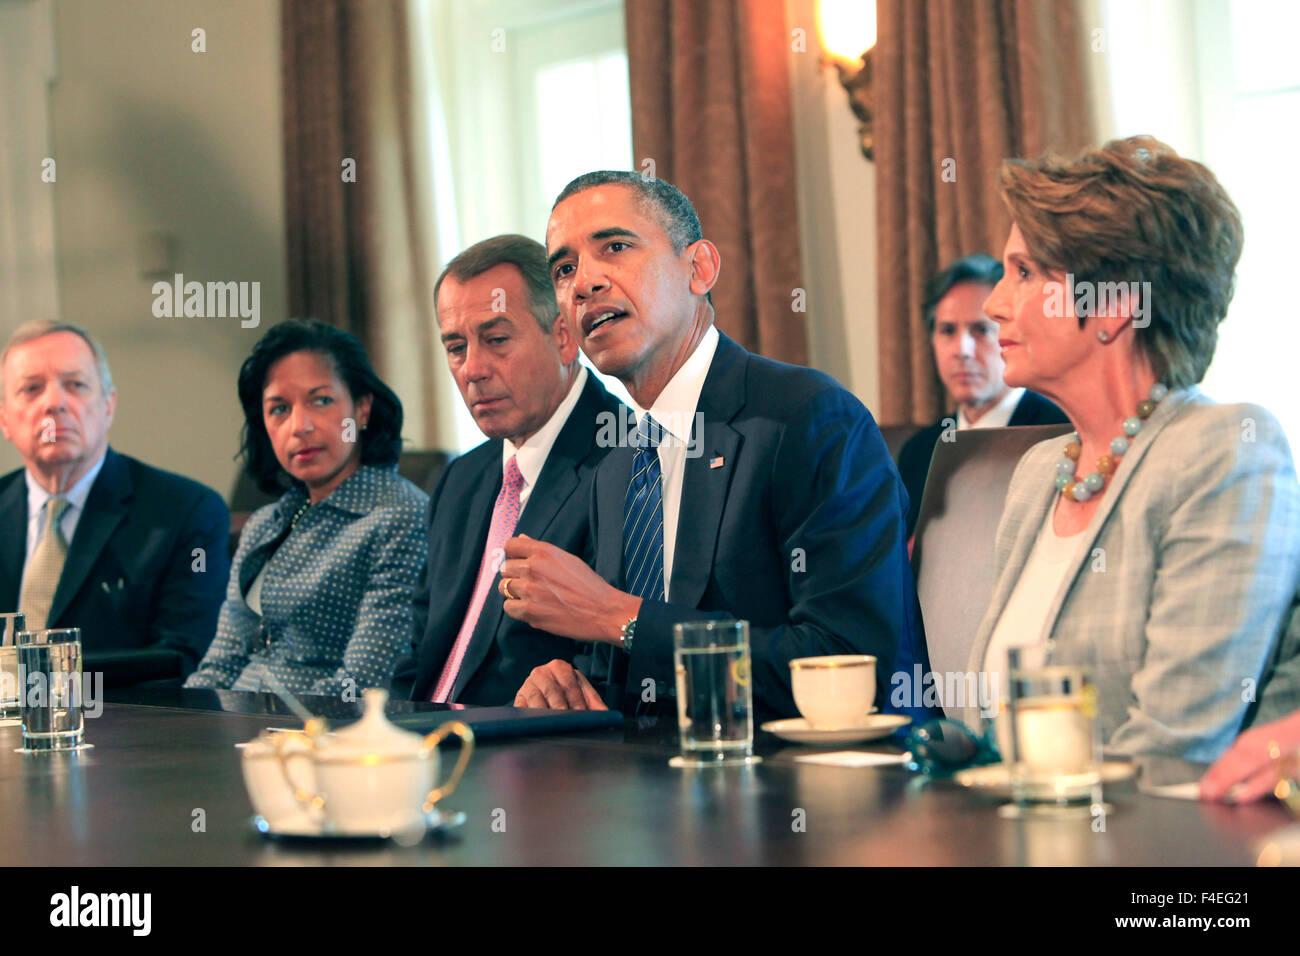 was obama a democratic leader